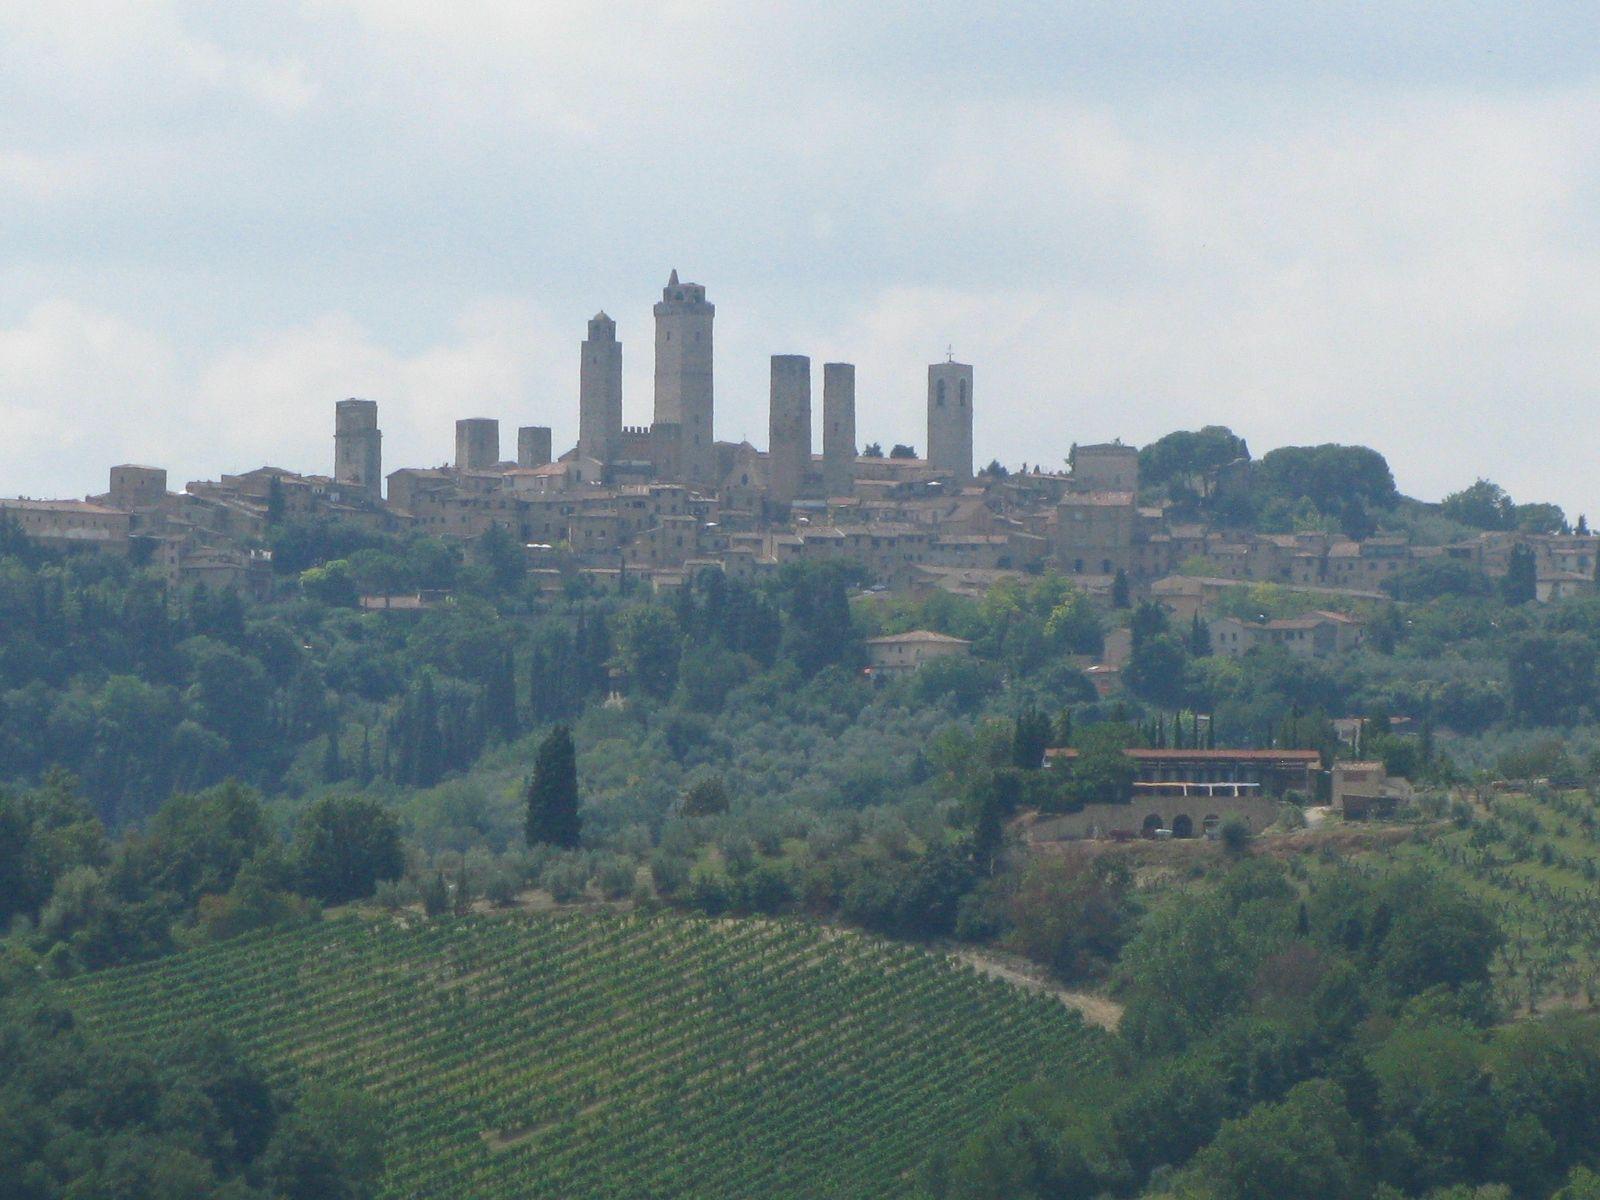 San gimignano towers, Italia